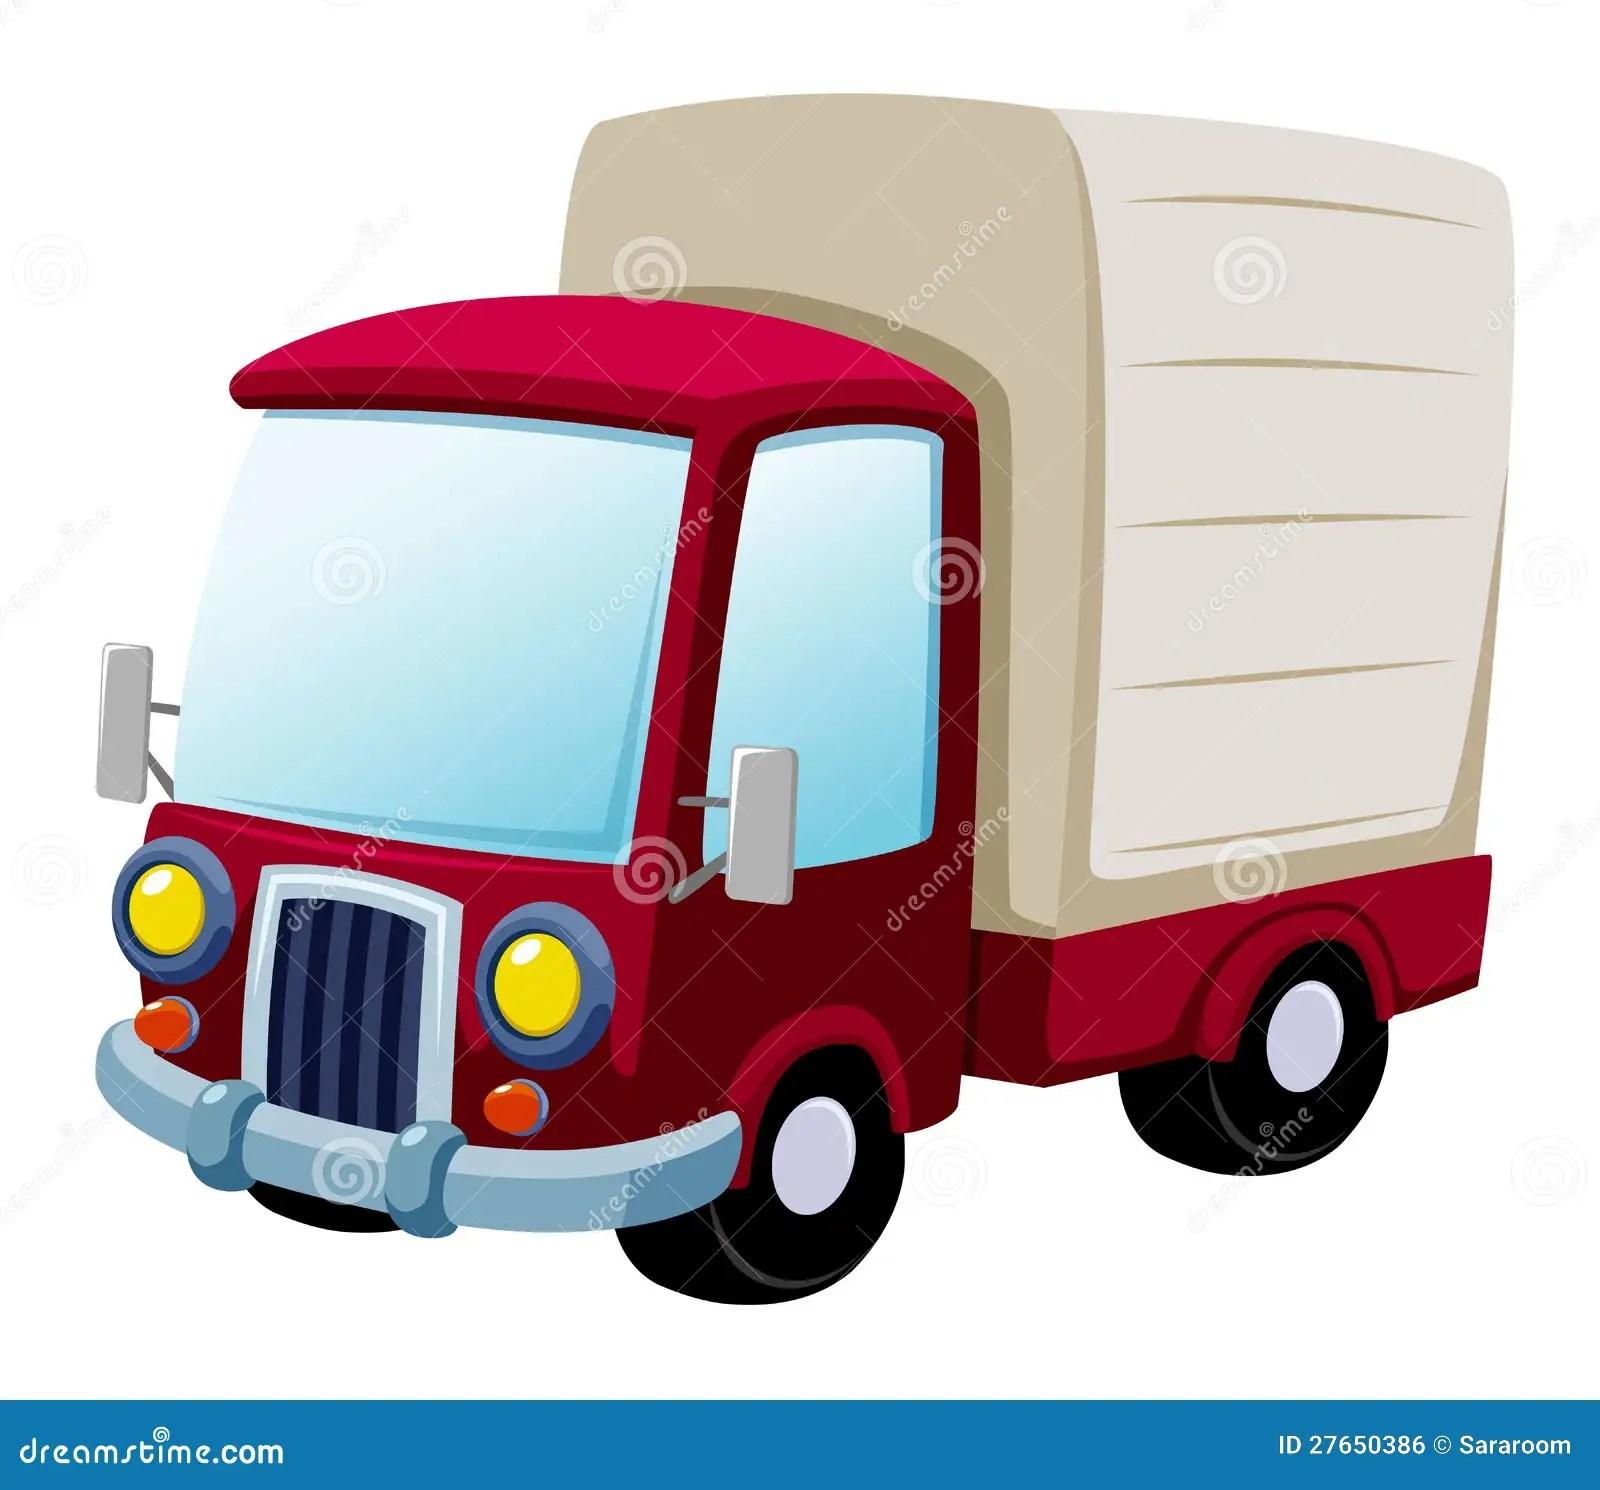 Cartoon Truck Stock Vector Image Of Lorry, Semi, Traffic